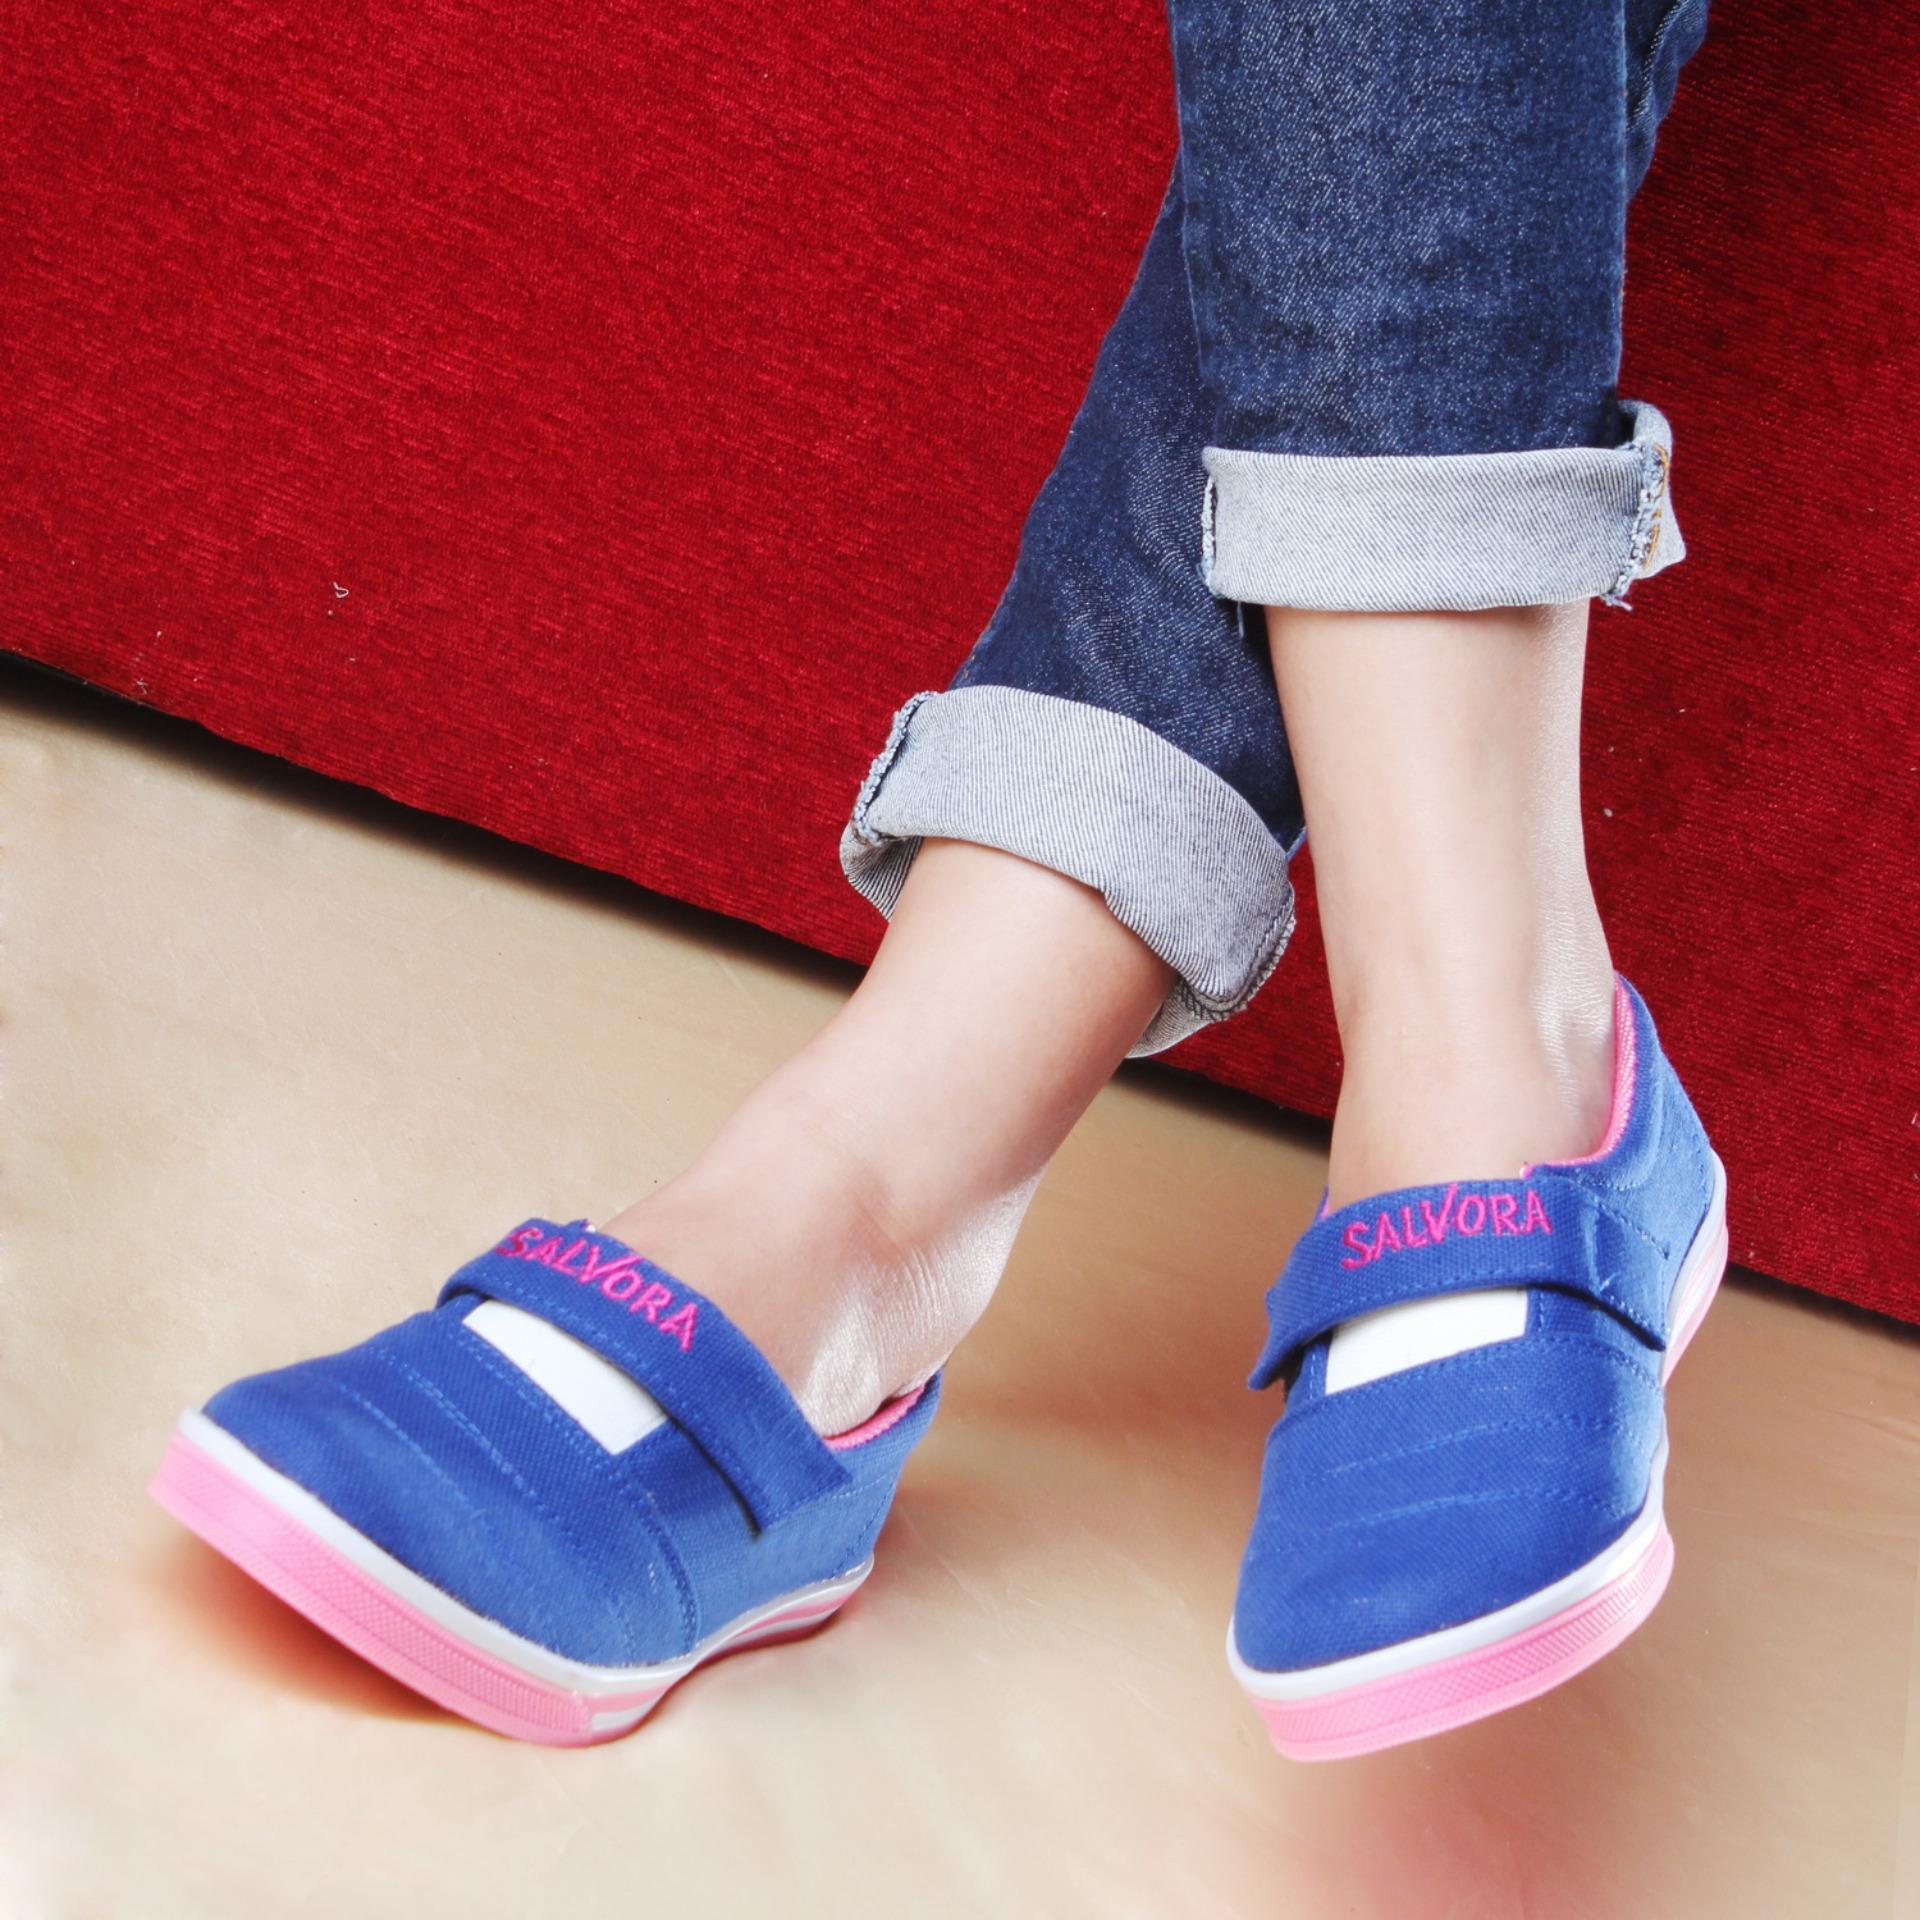 Salvora / Fashion wanita / flat shoes / flat shoes wanita / flatshoes / sepatu casual / sepatu cewek / sepatu cewe / sepatu flat / sepatu flat wanita ...